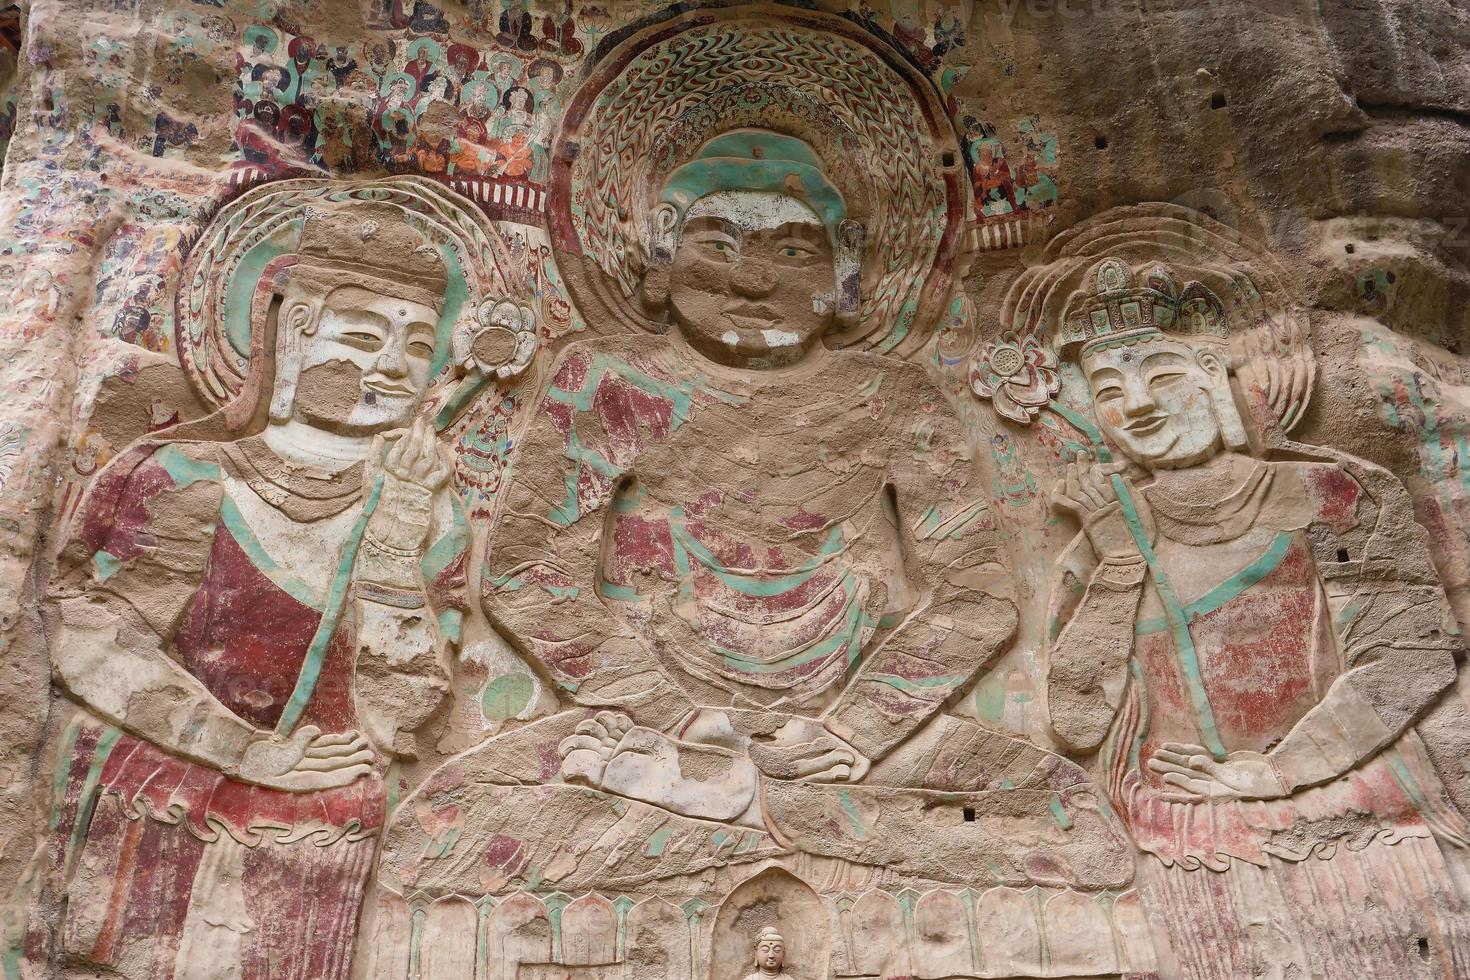 La gruta del templo de la Shao pintura en relieve en tianshui wushan china foto